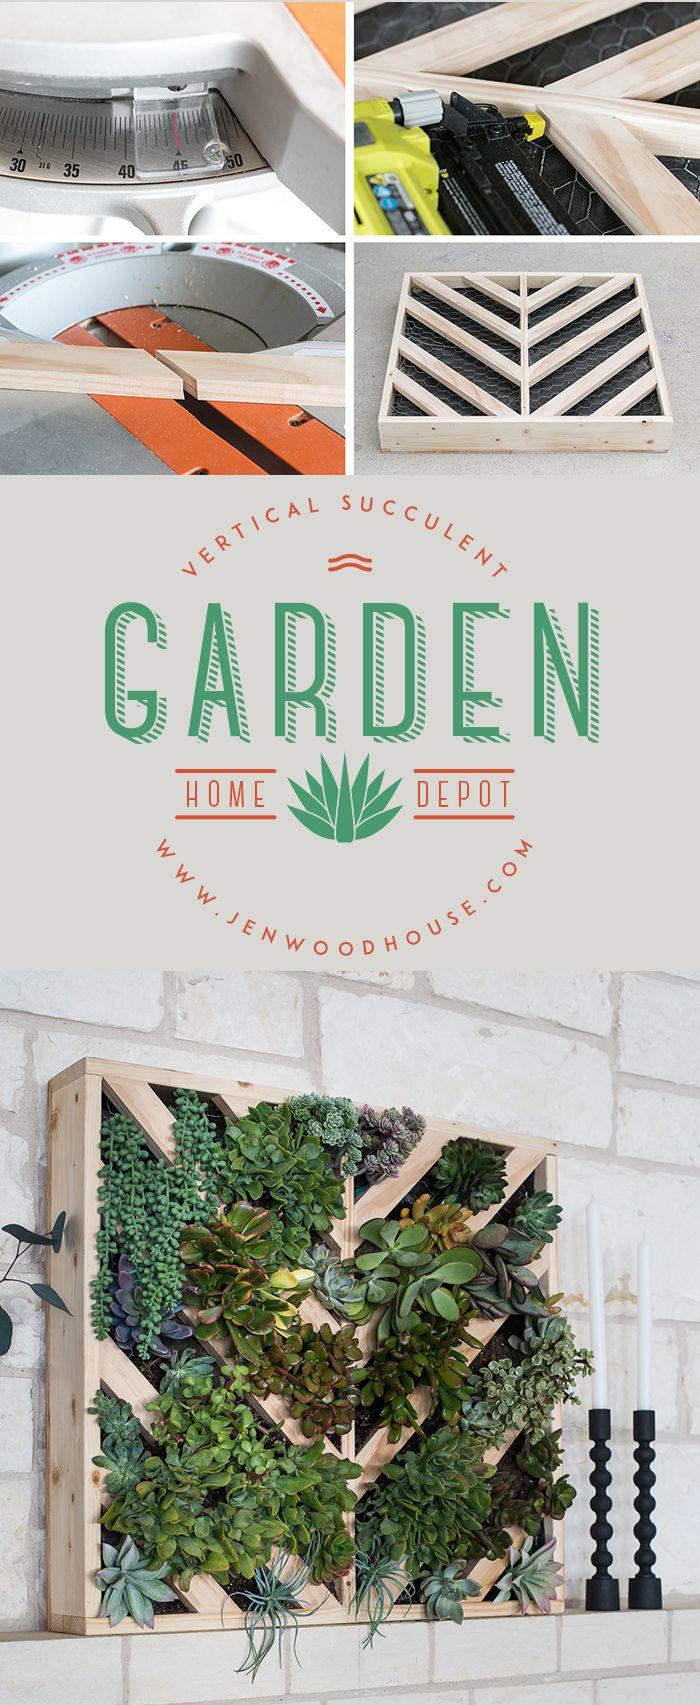 How to make a vertical succulent garden. #succulents #gardening http://jenwoodhouse.com/vertical-succulent-garden/